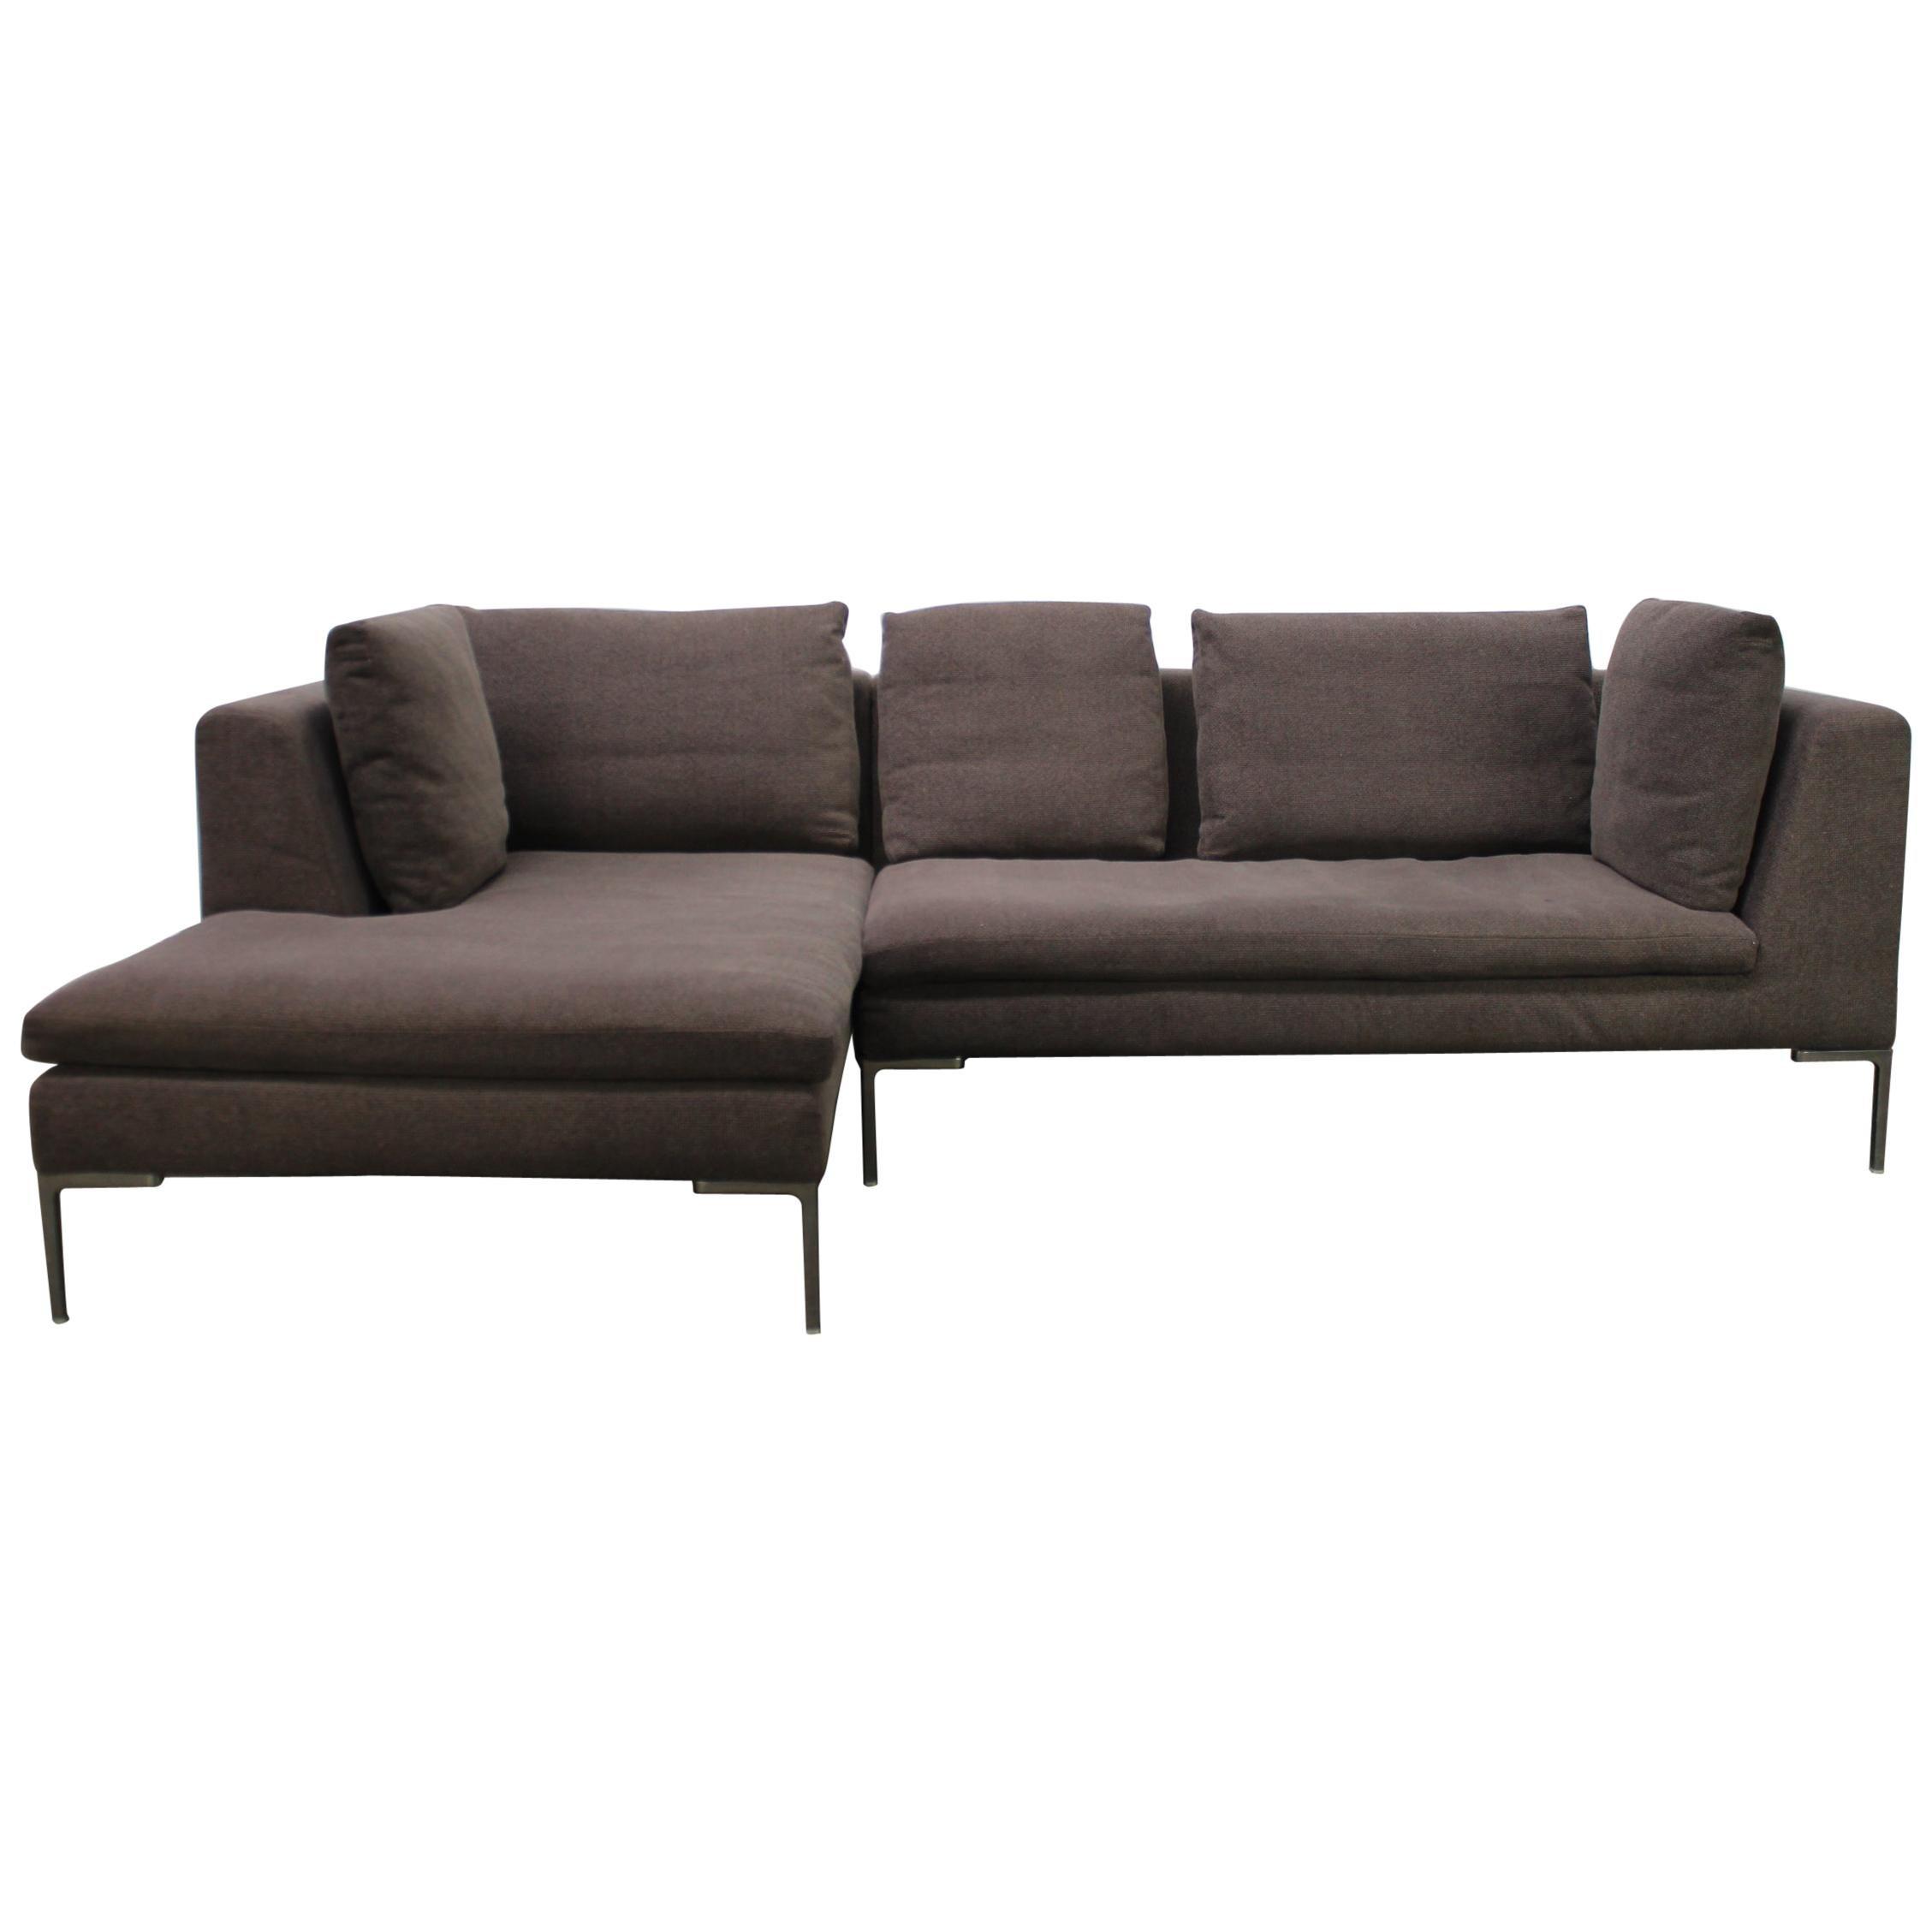 Astonishing Bb Italia Charles Compact L Shape Sectional Sofa In Grey Ibusinesslaw Wood Chair Design Ideas Ibusinesslaworg